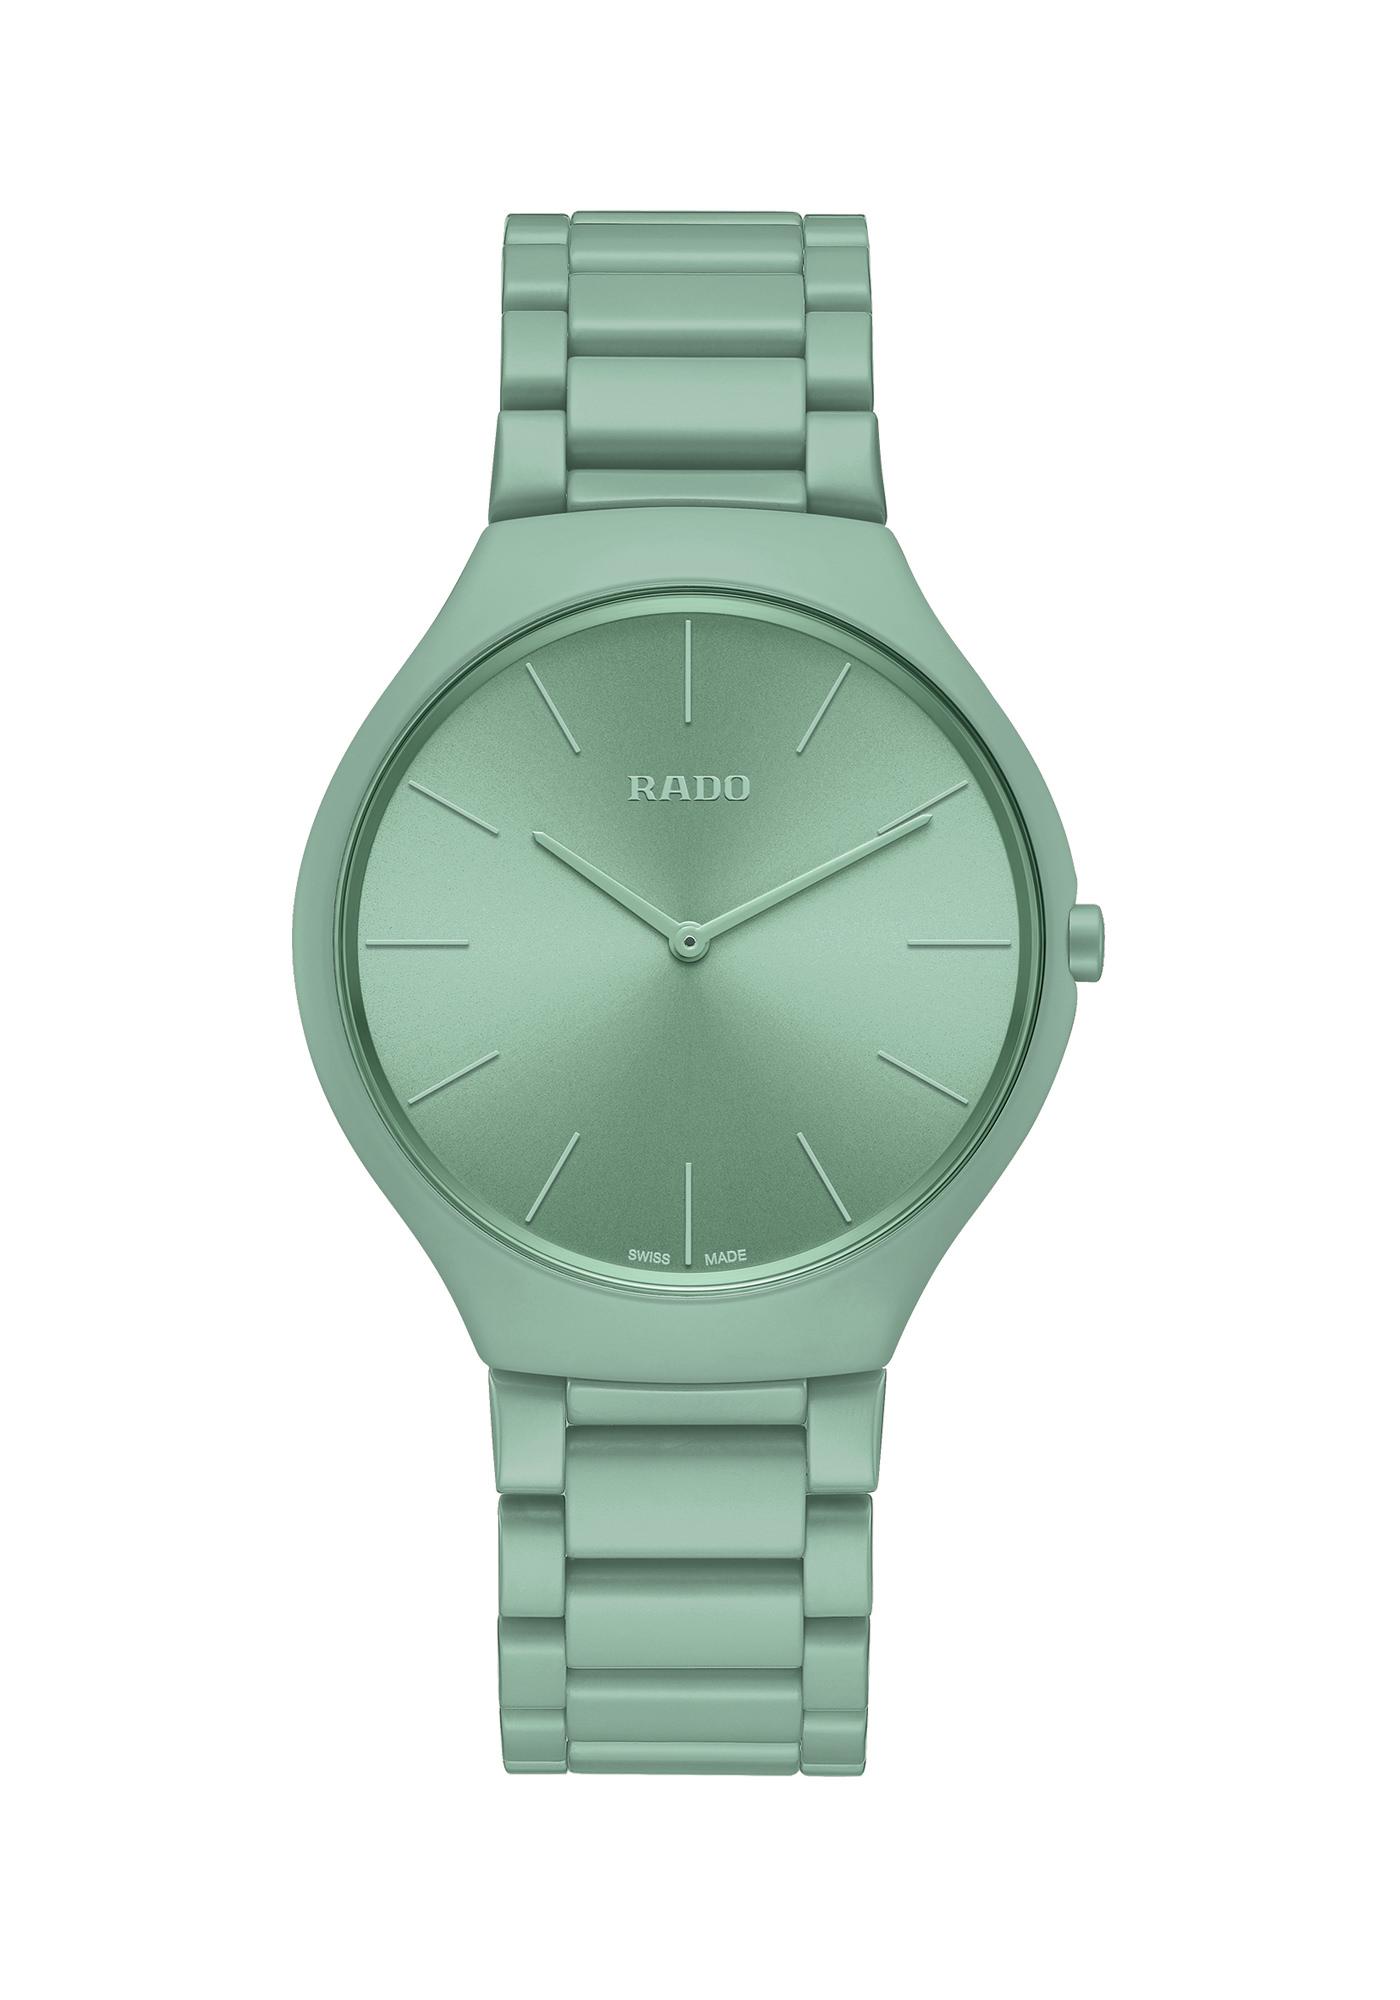 Rado Montres True Thinline Les Couleurs Le Corbusier Slightly Greyed English Green 32041